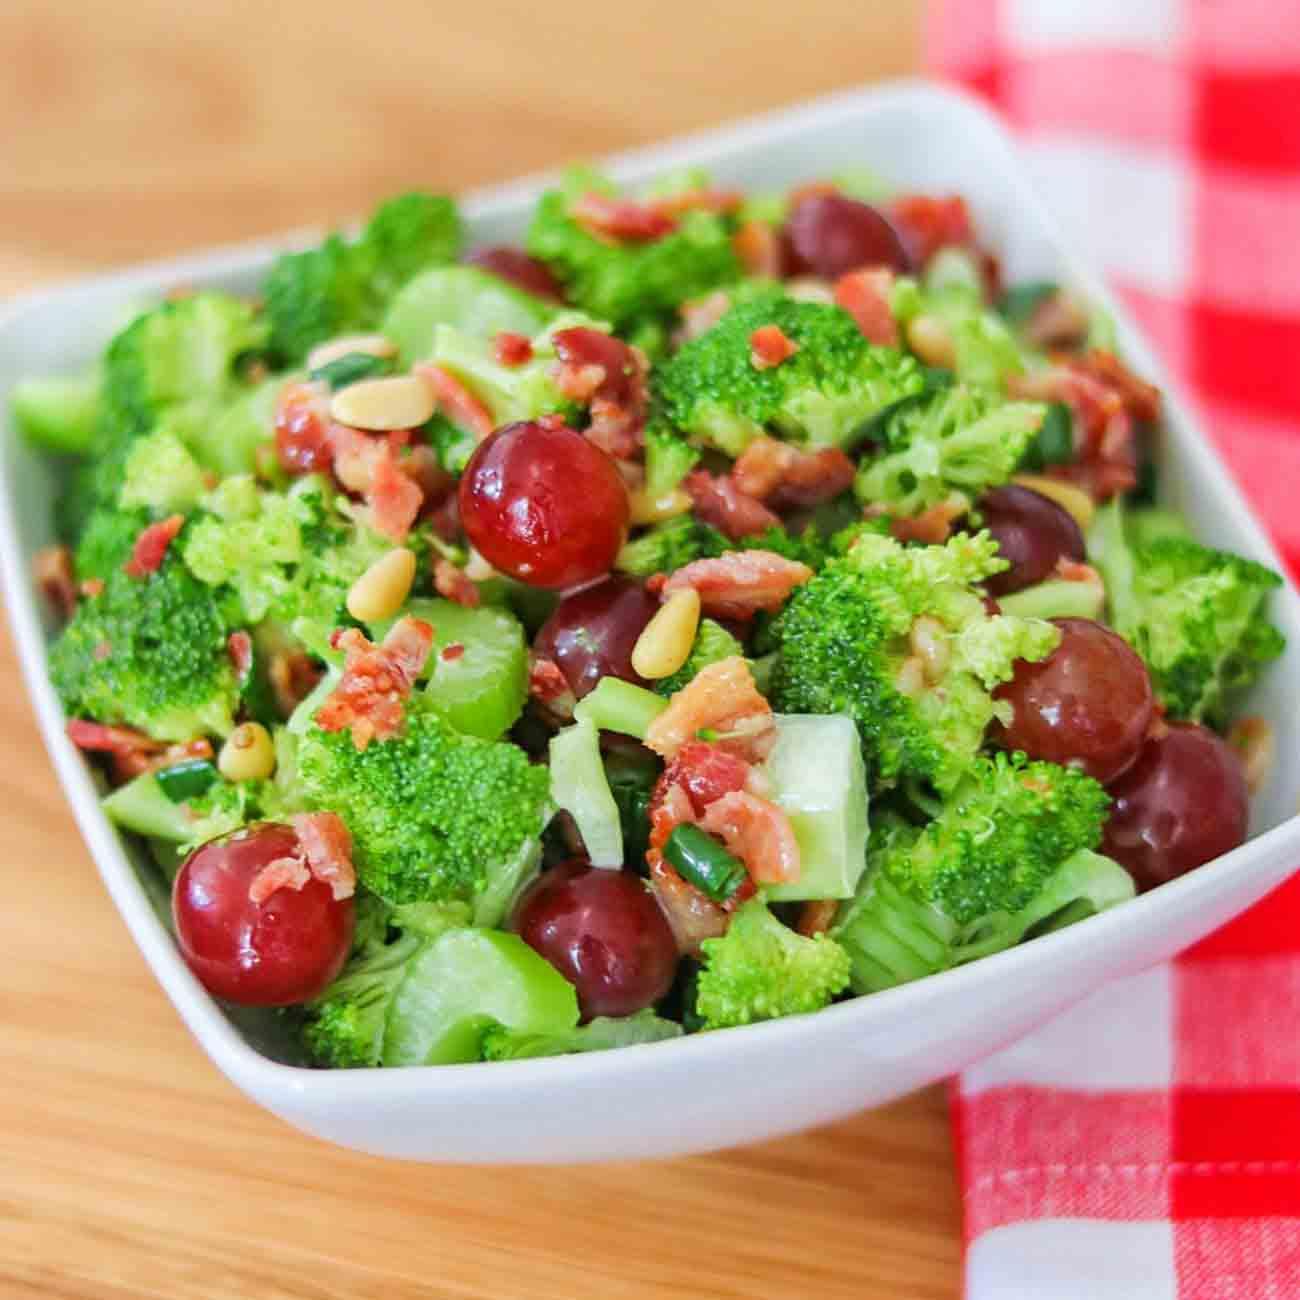 Fresh Healthy Salad with Cherries